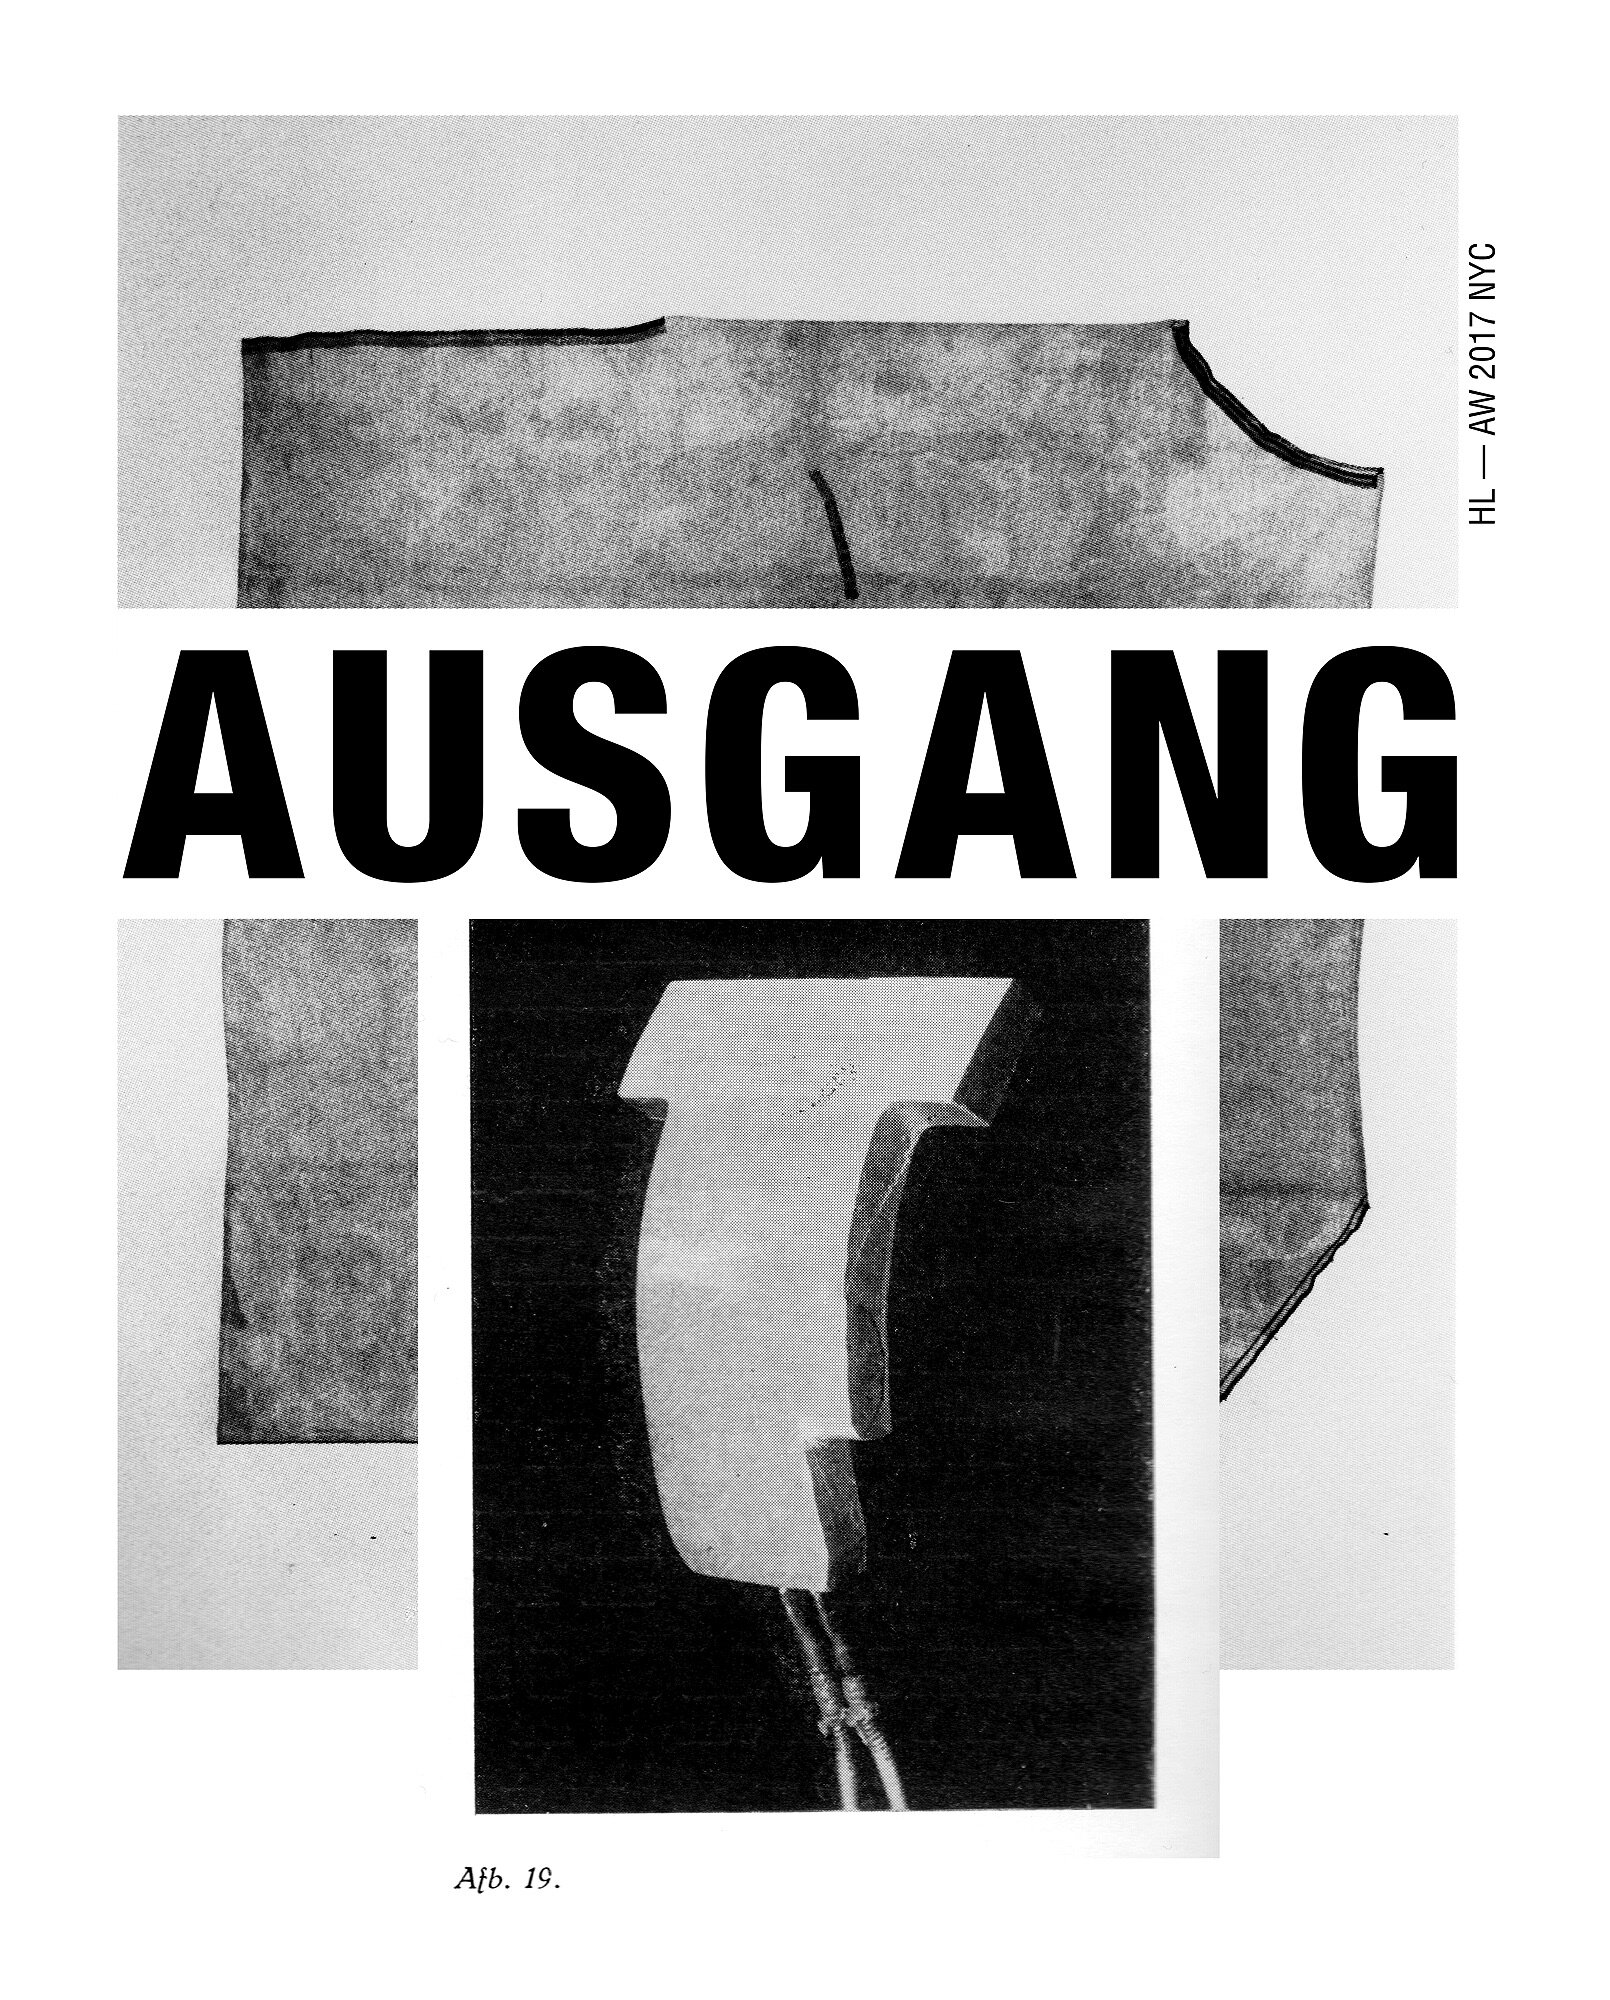 HL_AUSGANG_TOTAL.jpg